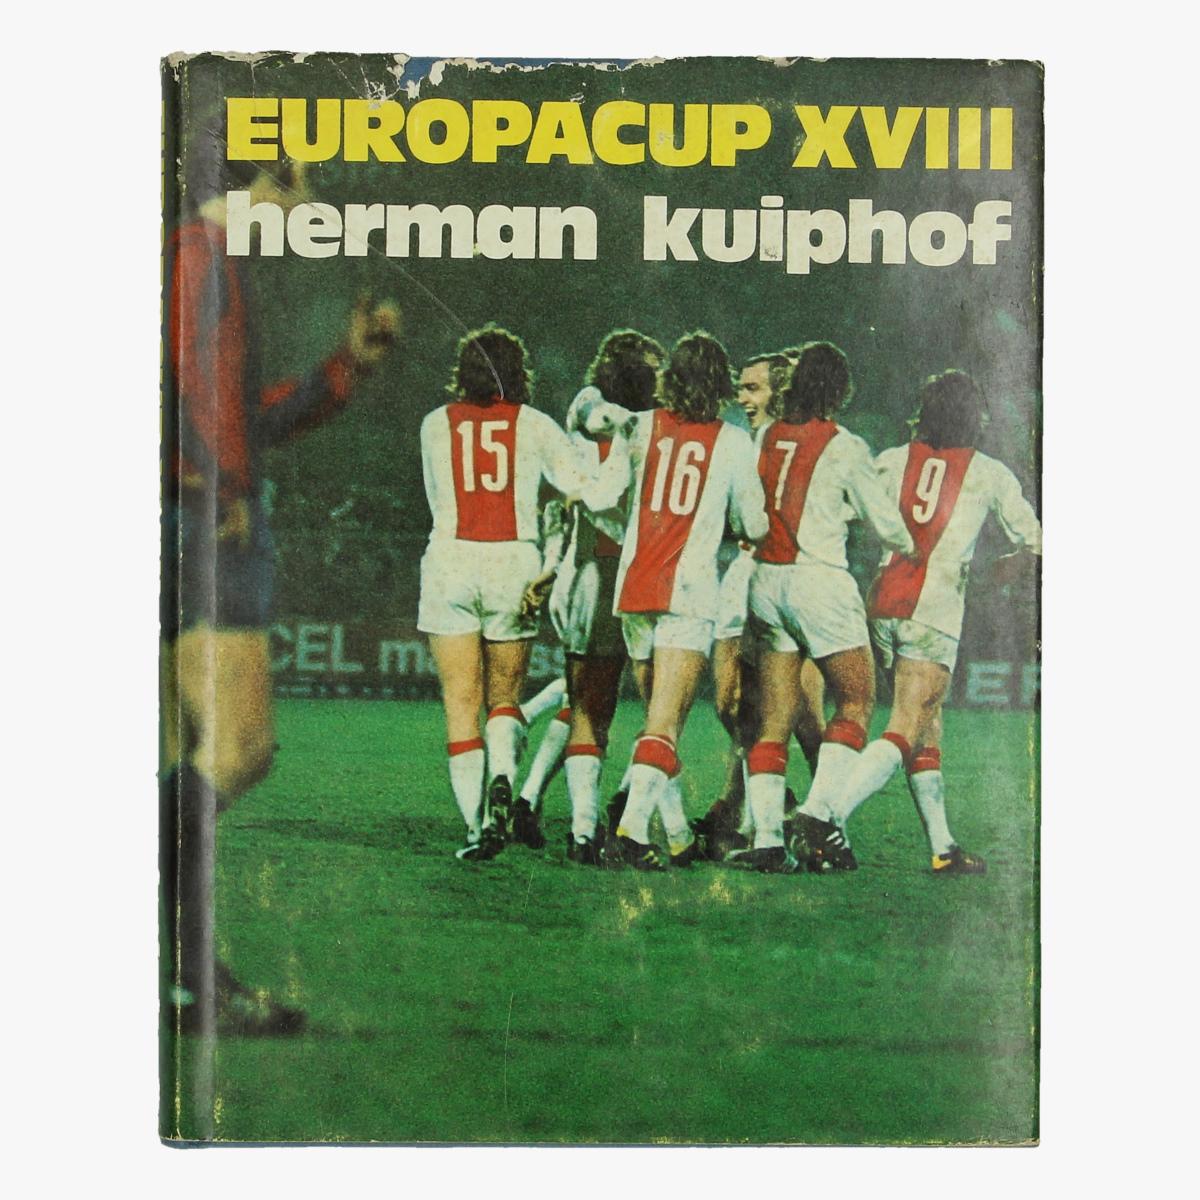 Afbeeldingen van boek voetbal europacup XVIII herman kuiphof 1972/73 uitgeverij luitingh - laren n.h